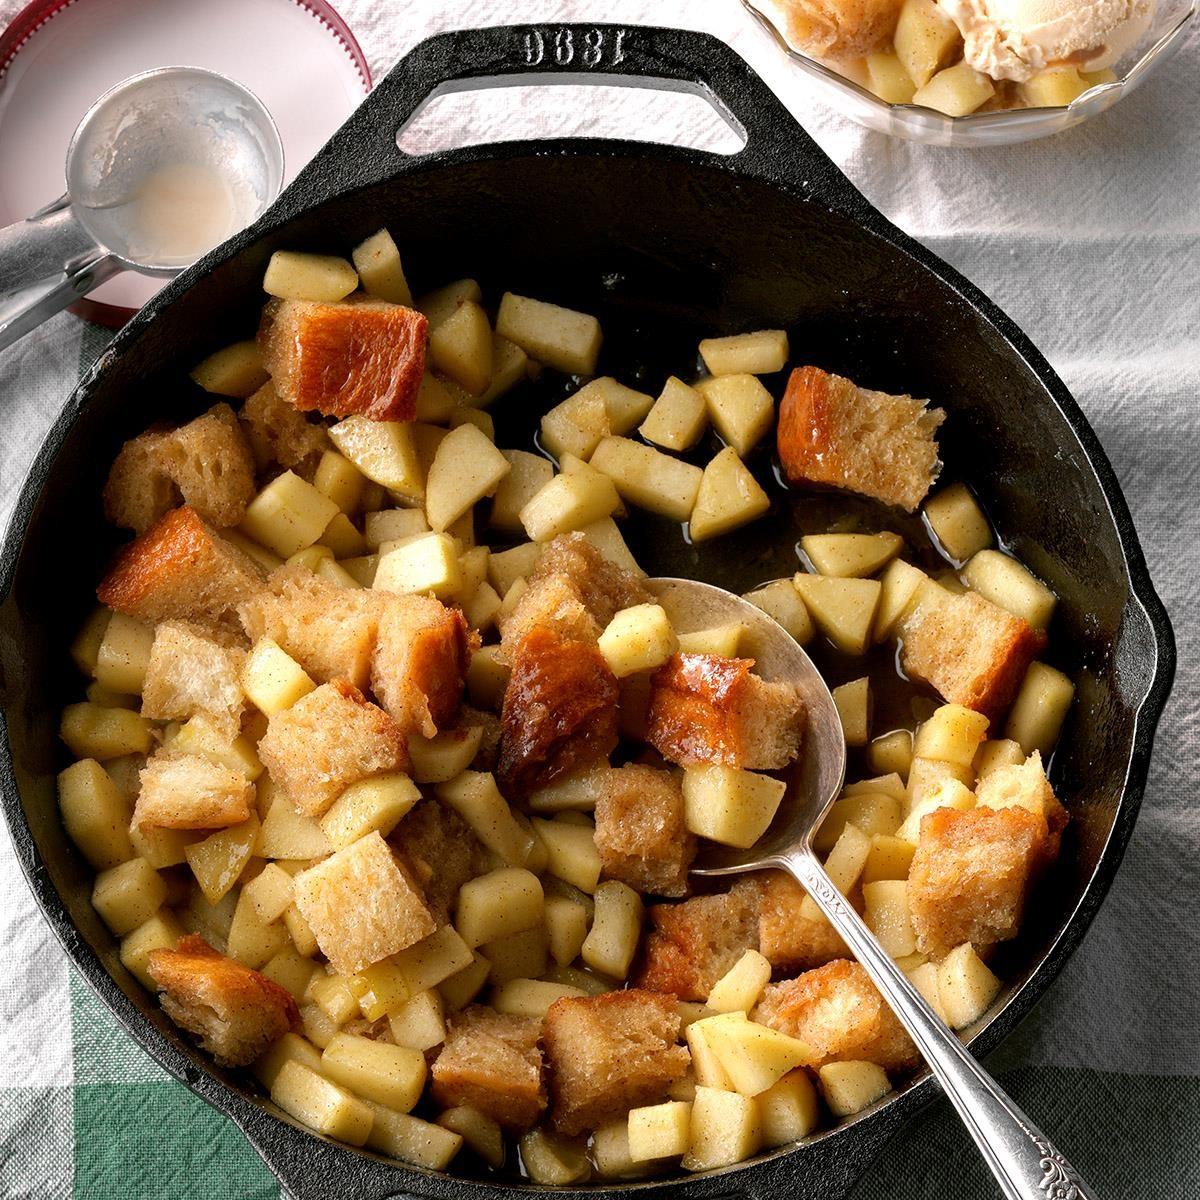 Cinnamon Apple Pan Betty